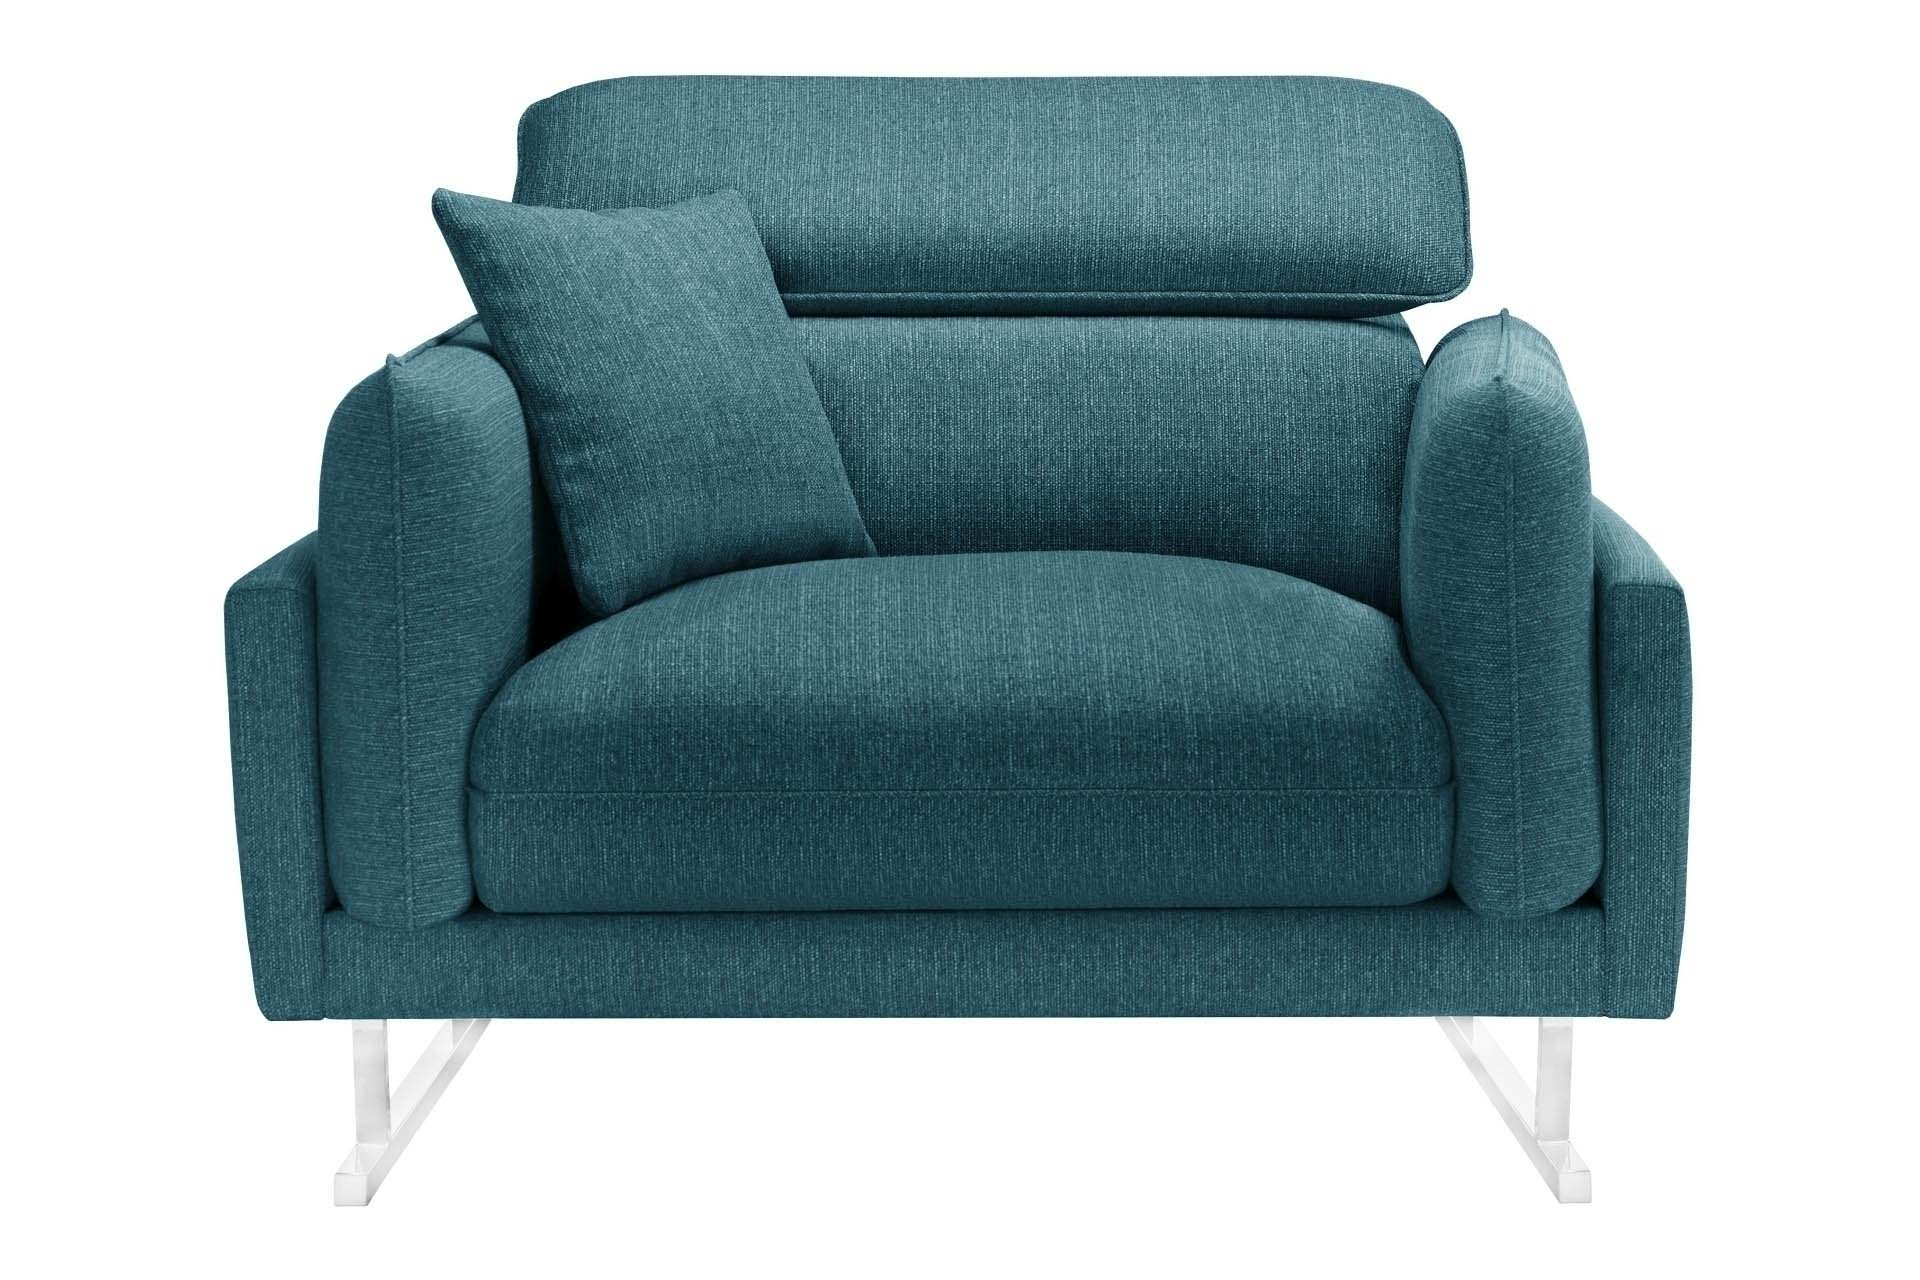 Fauteuil 1 place toucher lin turquoise